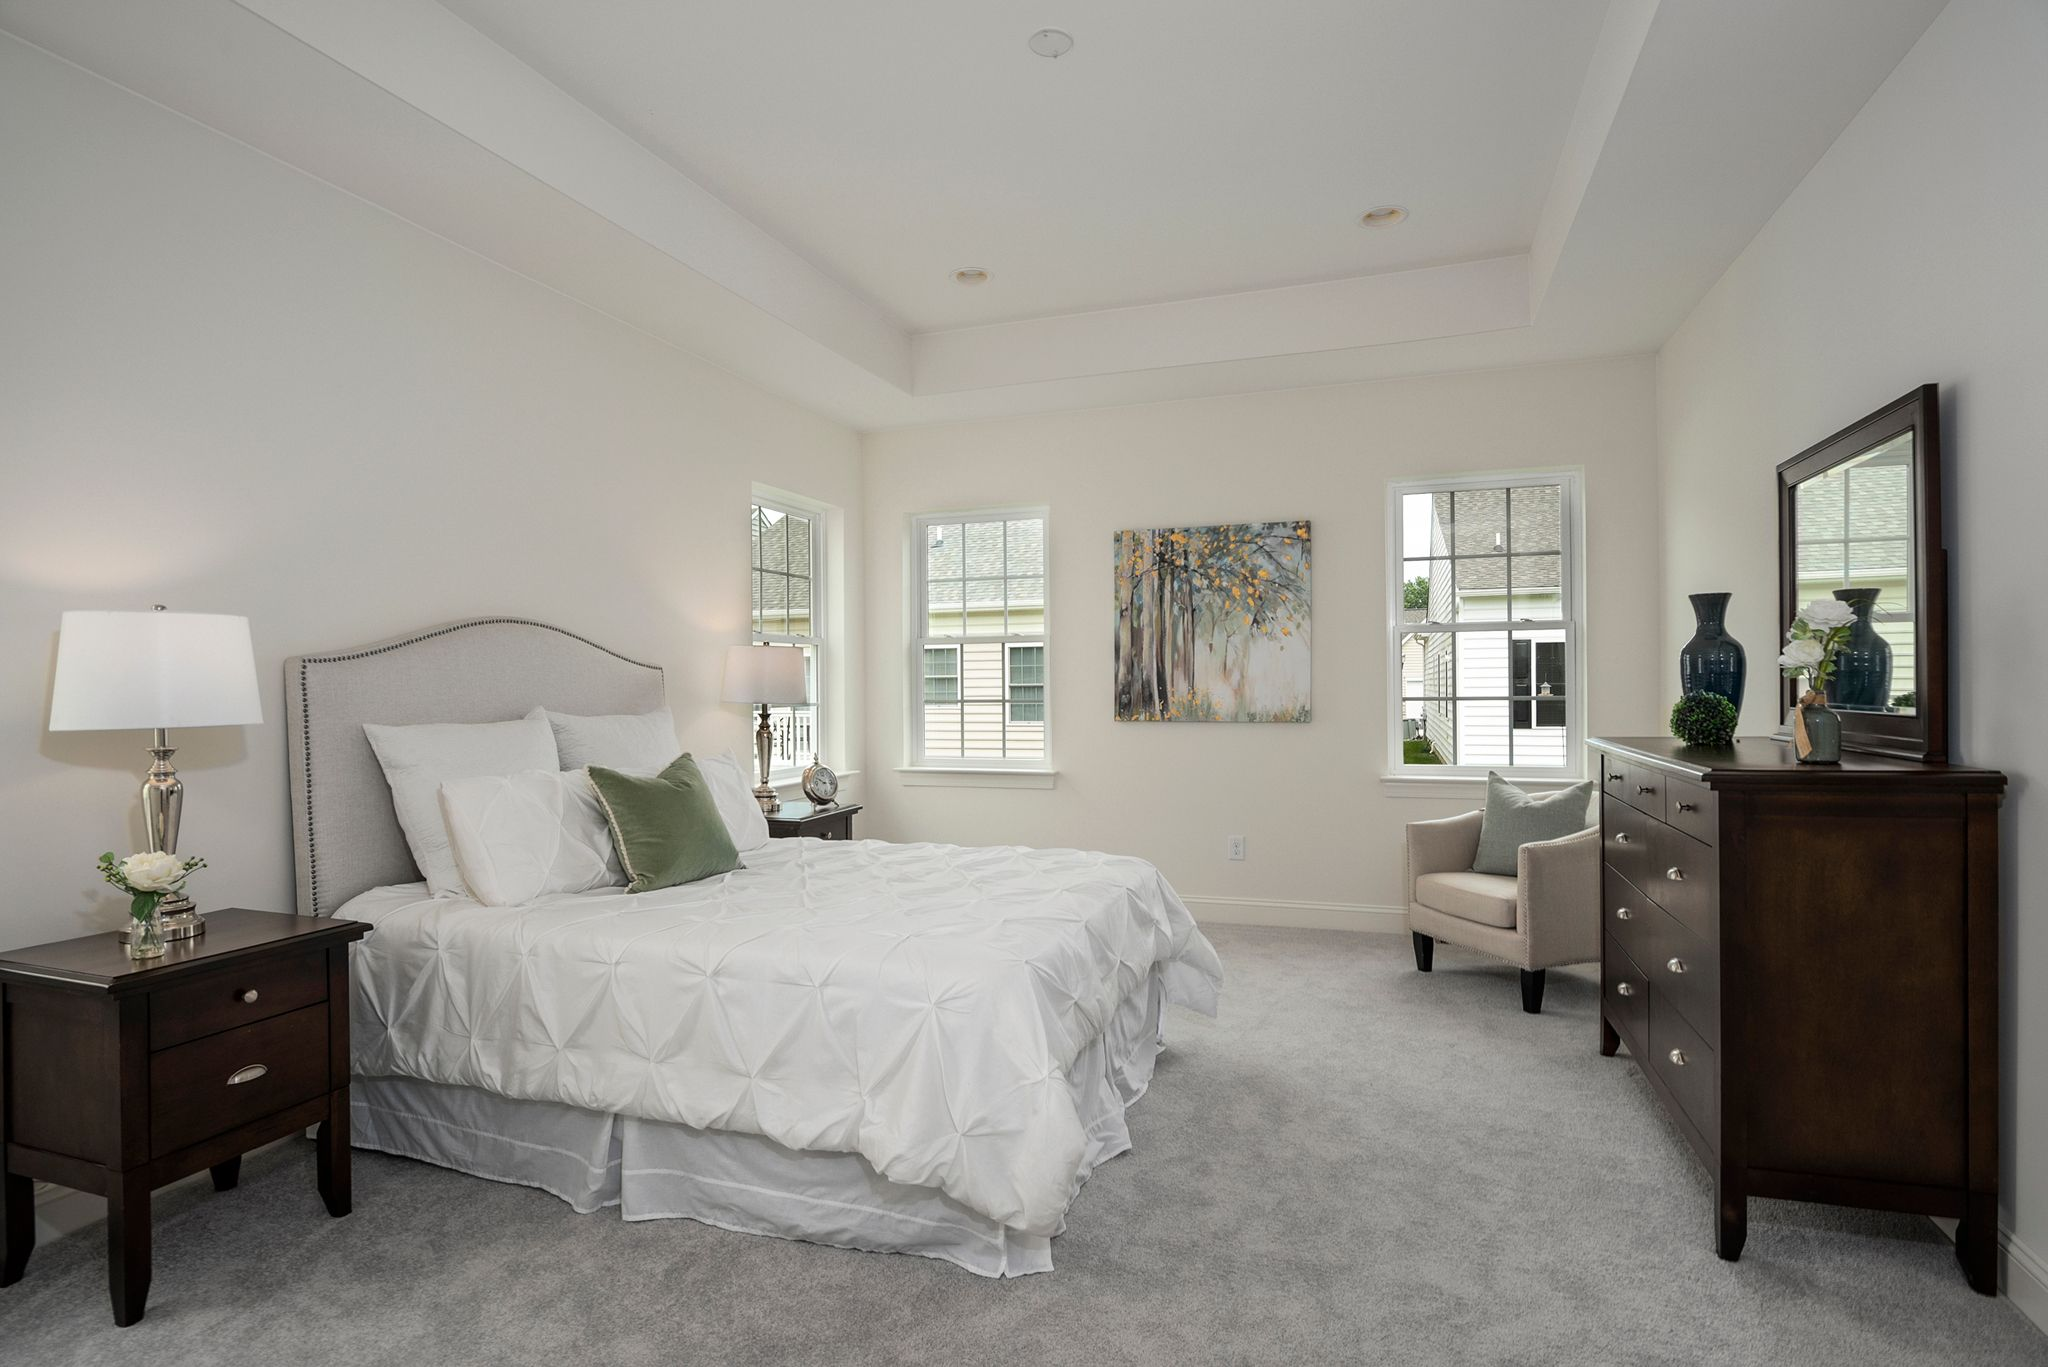 Bedroom featured in The Aston By Benchmark Builders in Dover, DE